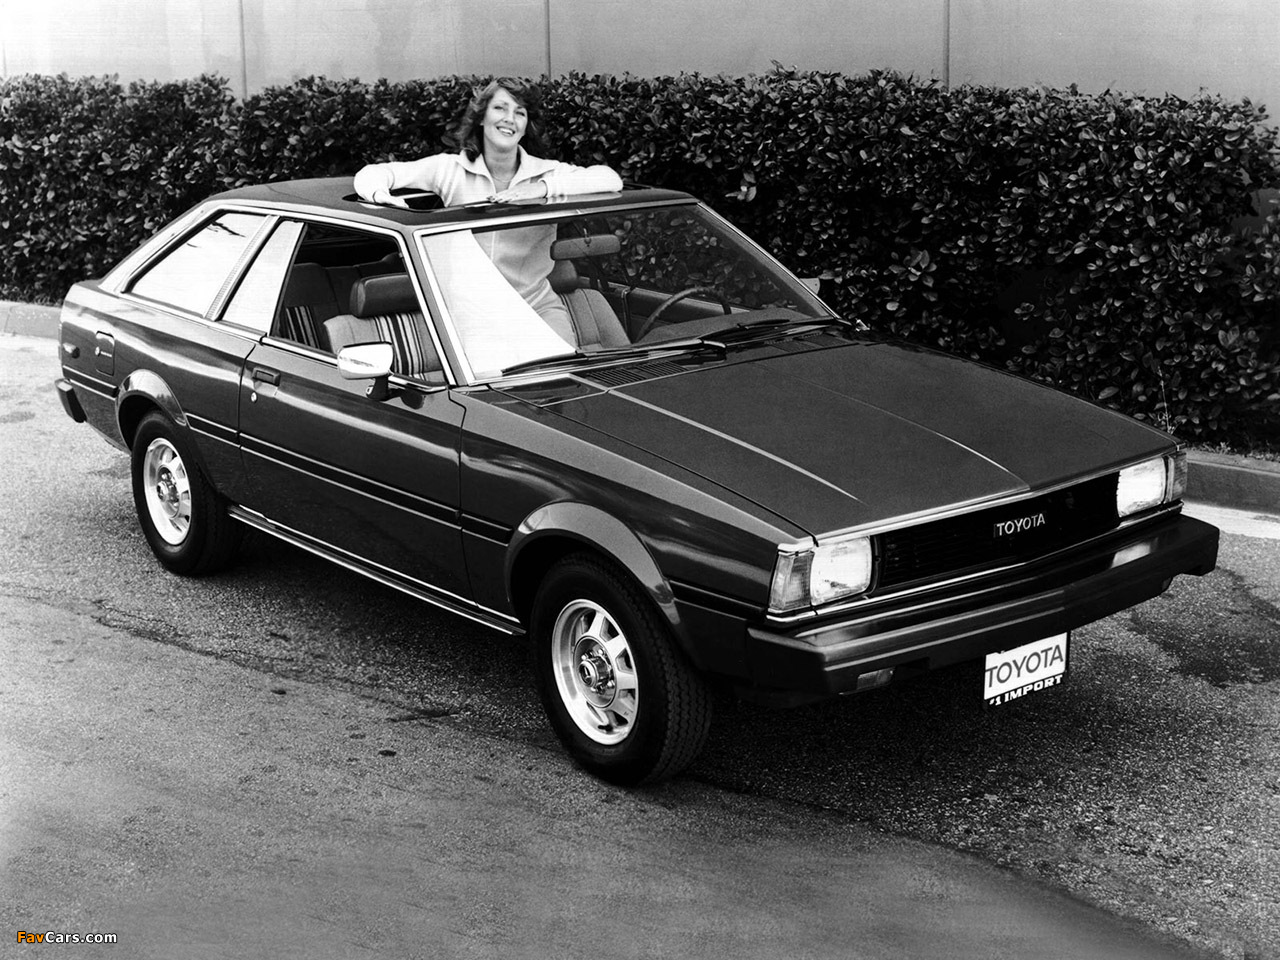 Toyota Corolla Sr5 Liftback Te72 1980 83 Wallpapers